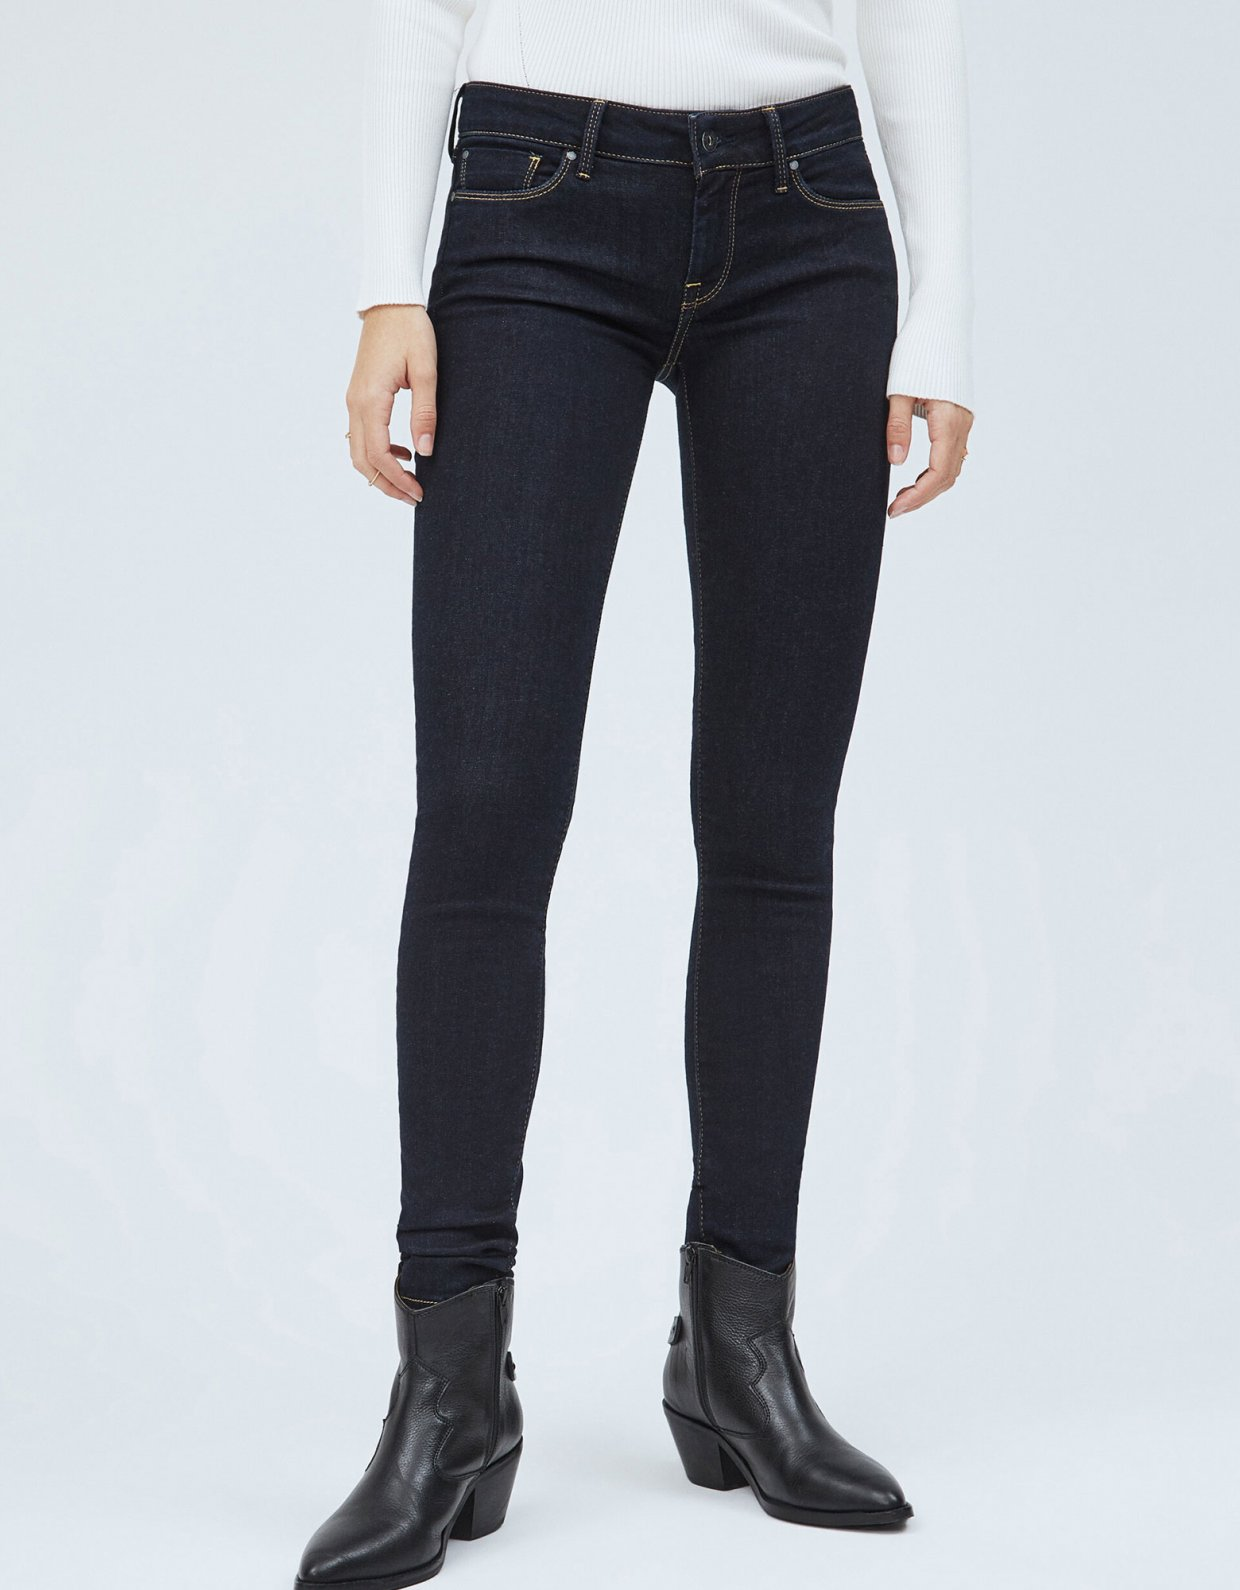 Pepe Jeans Soho skinny fit mid-waist jeans